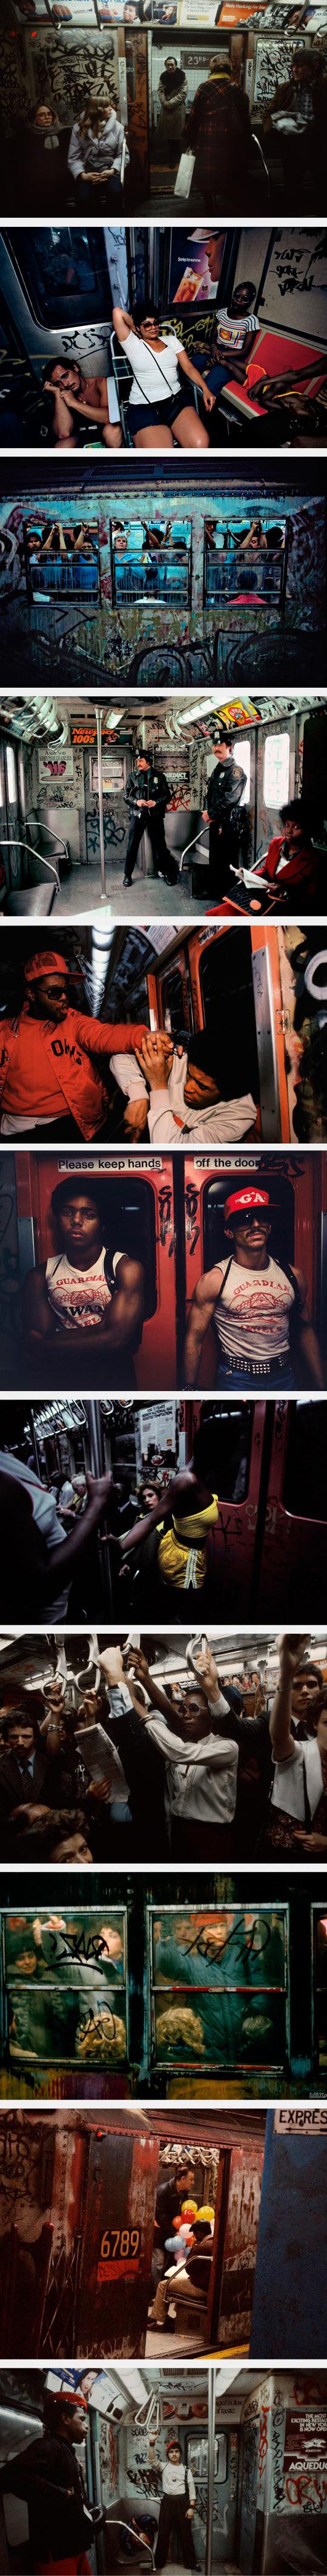 cool-subway-New-York-80-decade